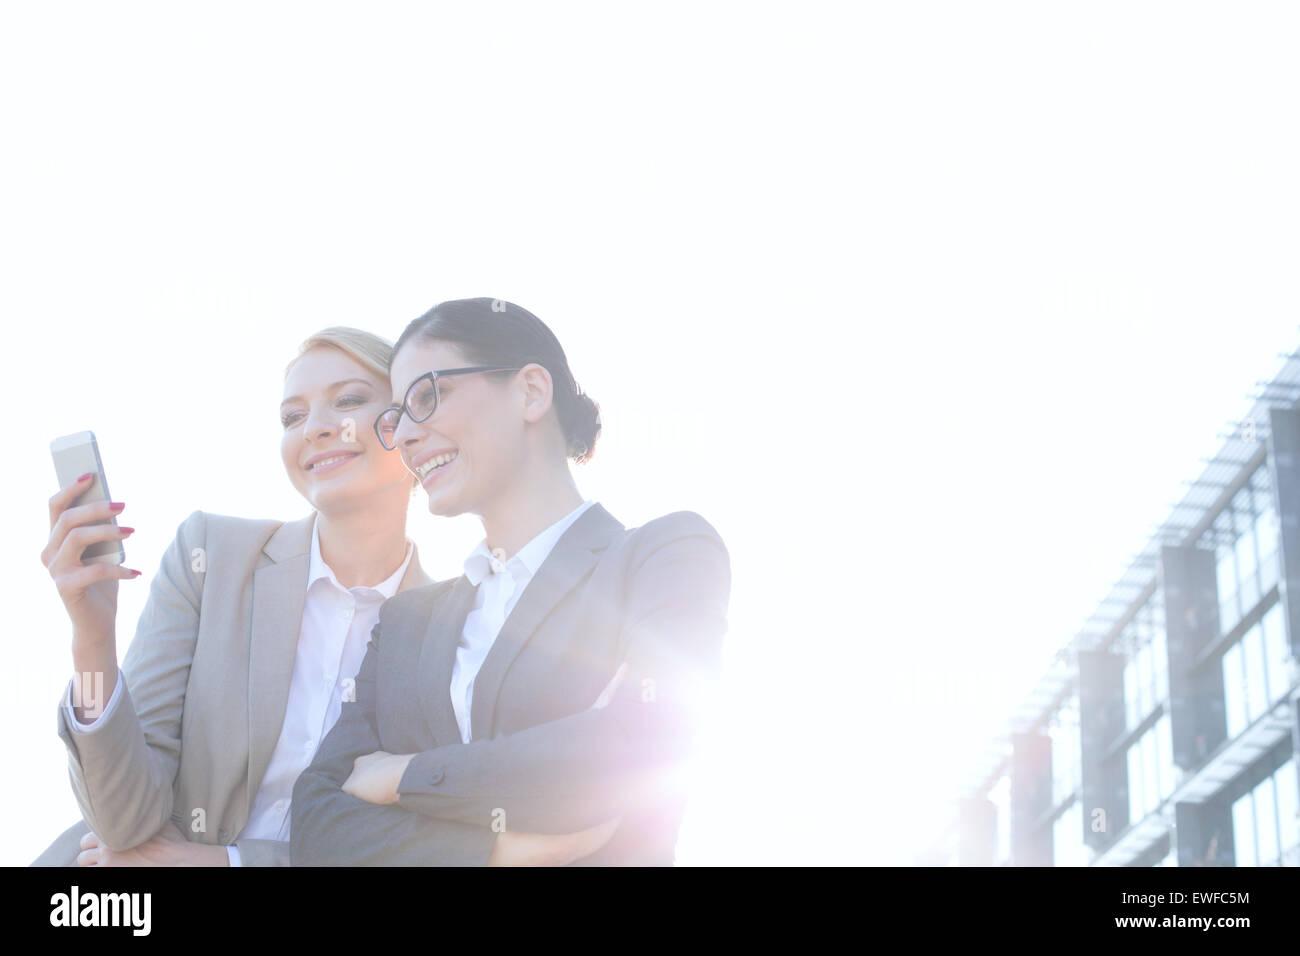 Low angle view of businesswomen using smart phone contre ciel clair aux beaux jours Photo Stock